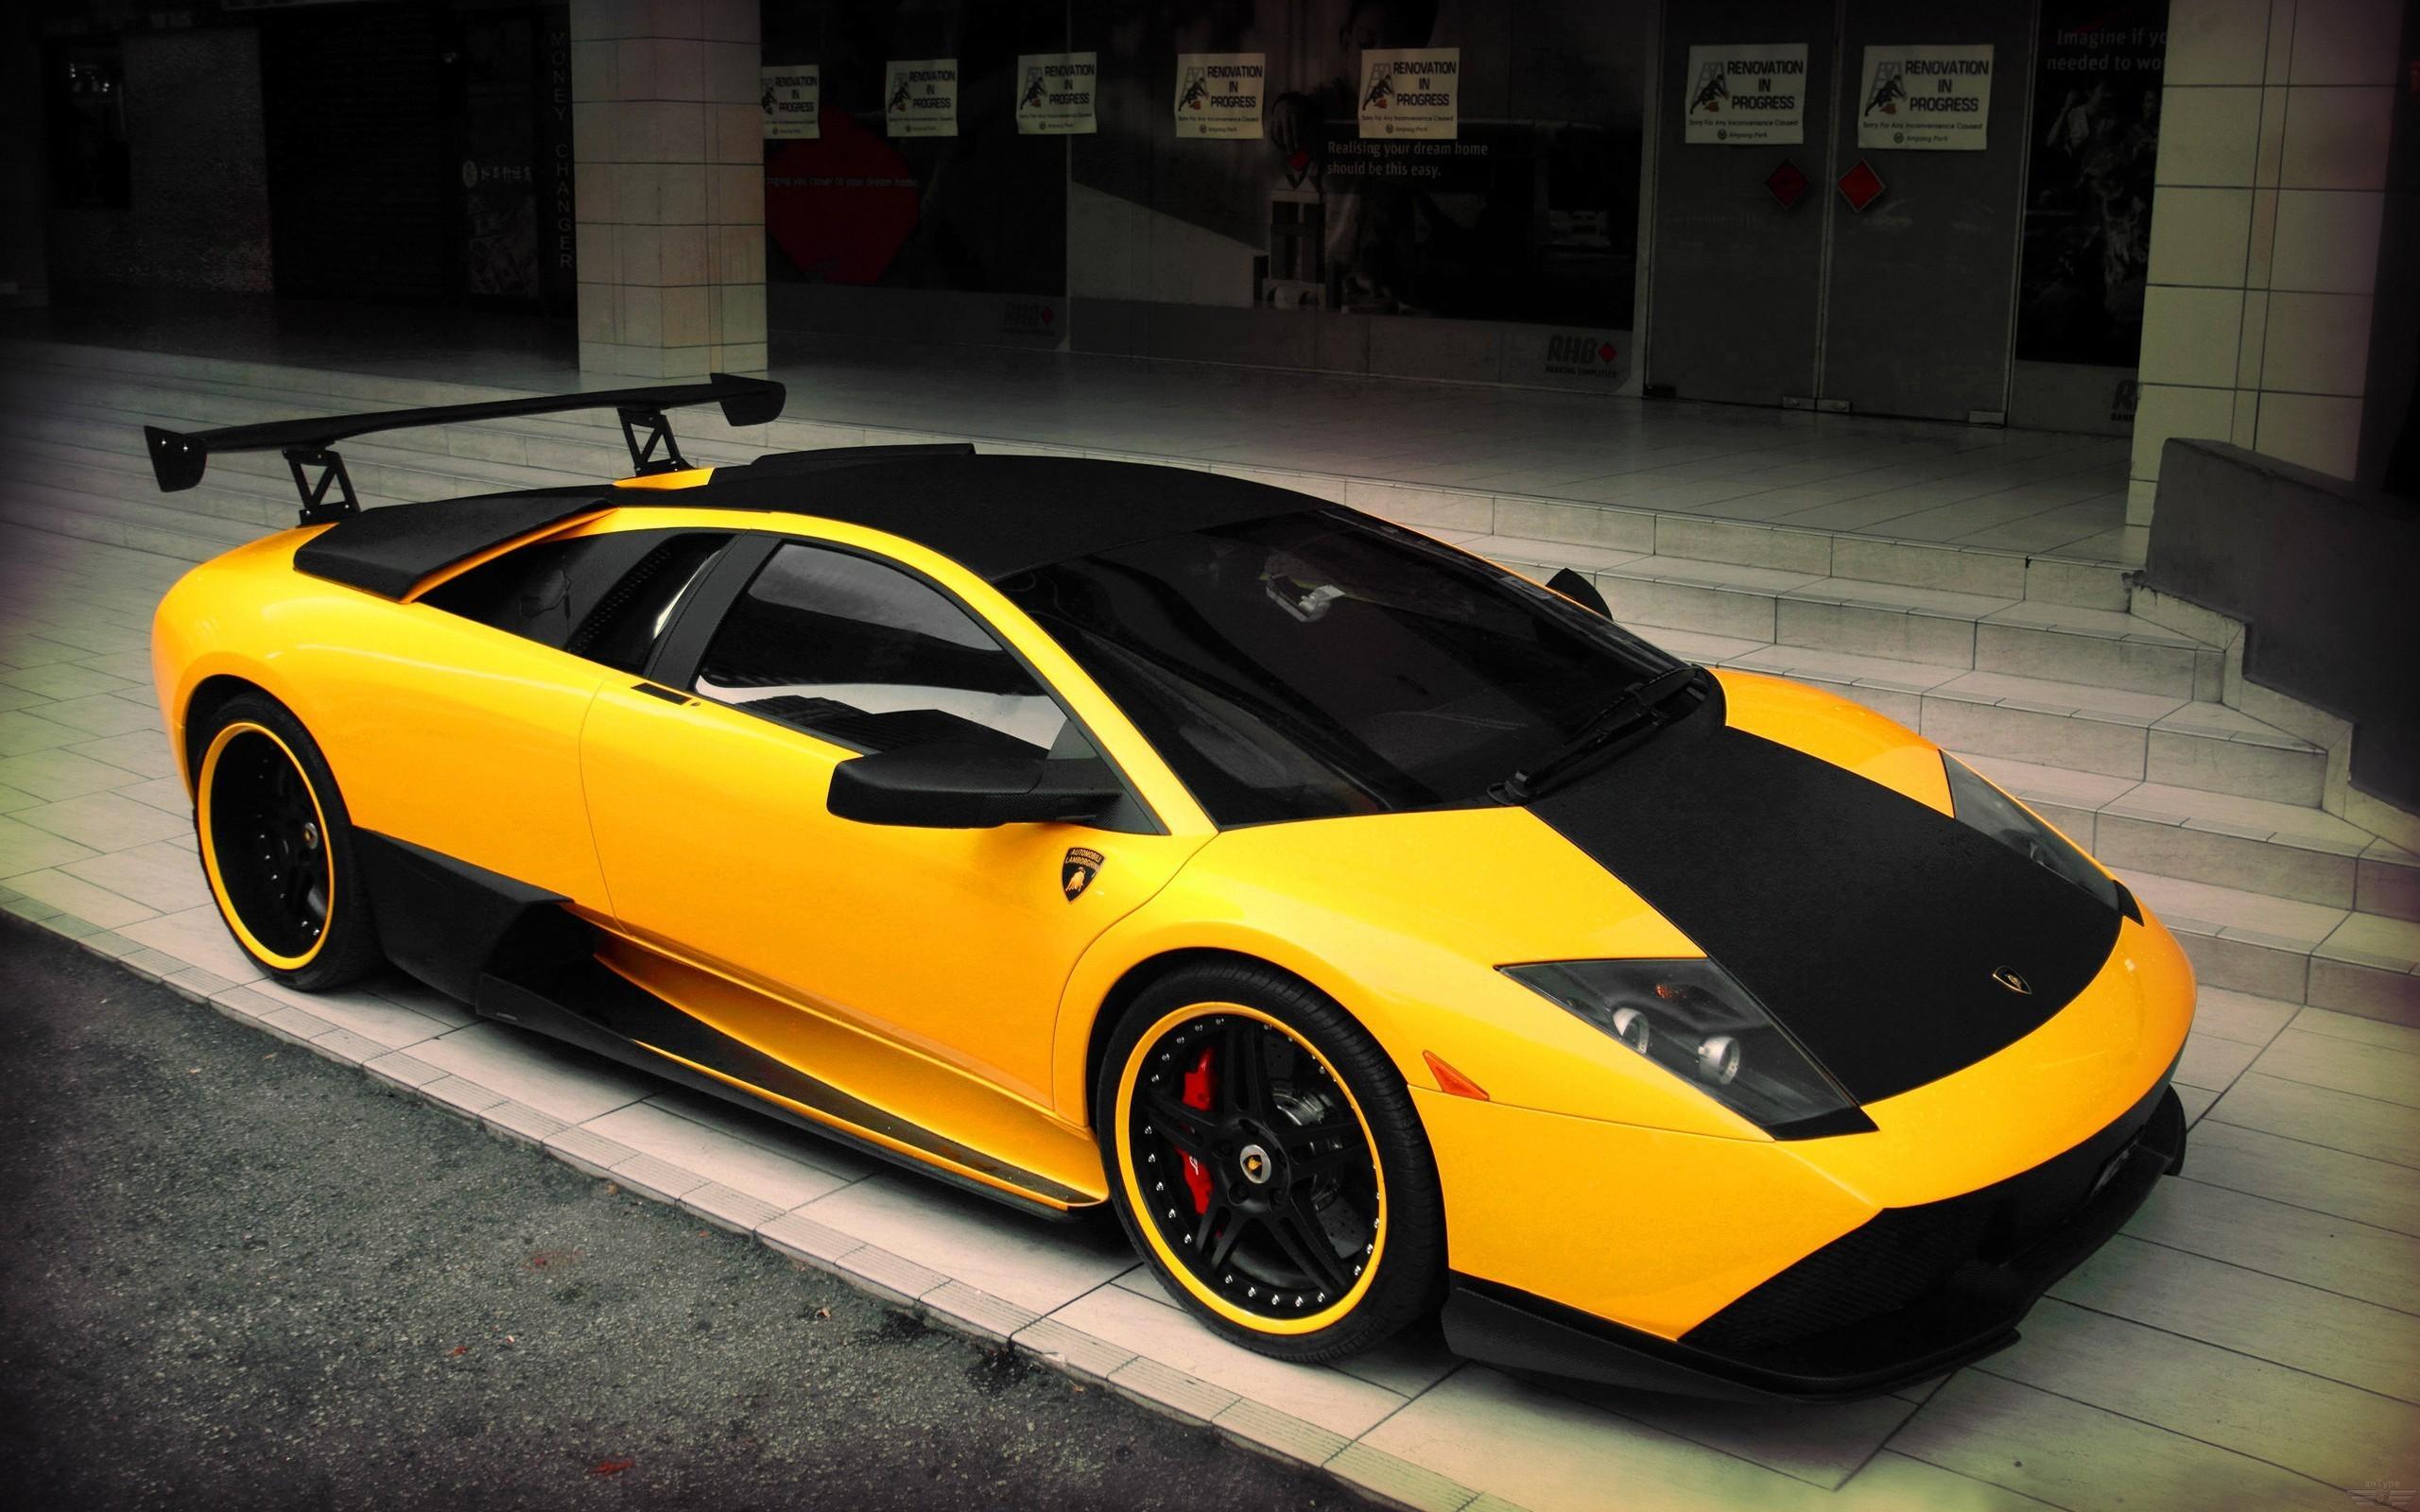 Yellow Lamborghini supercar wallpaper 2560x1600 2560x1600